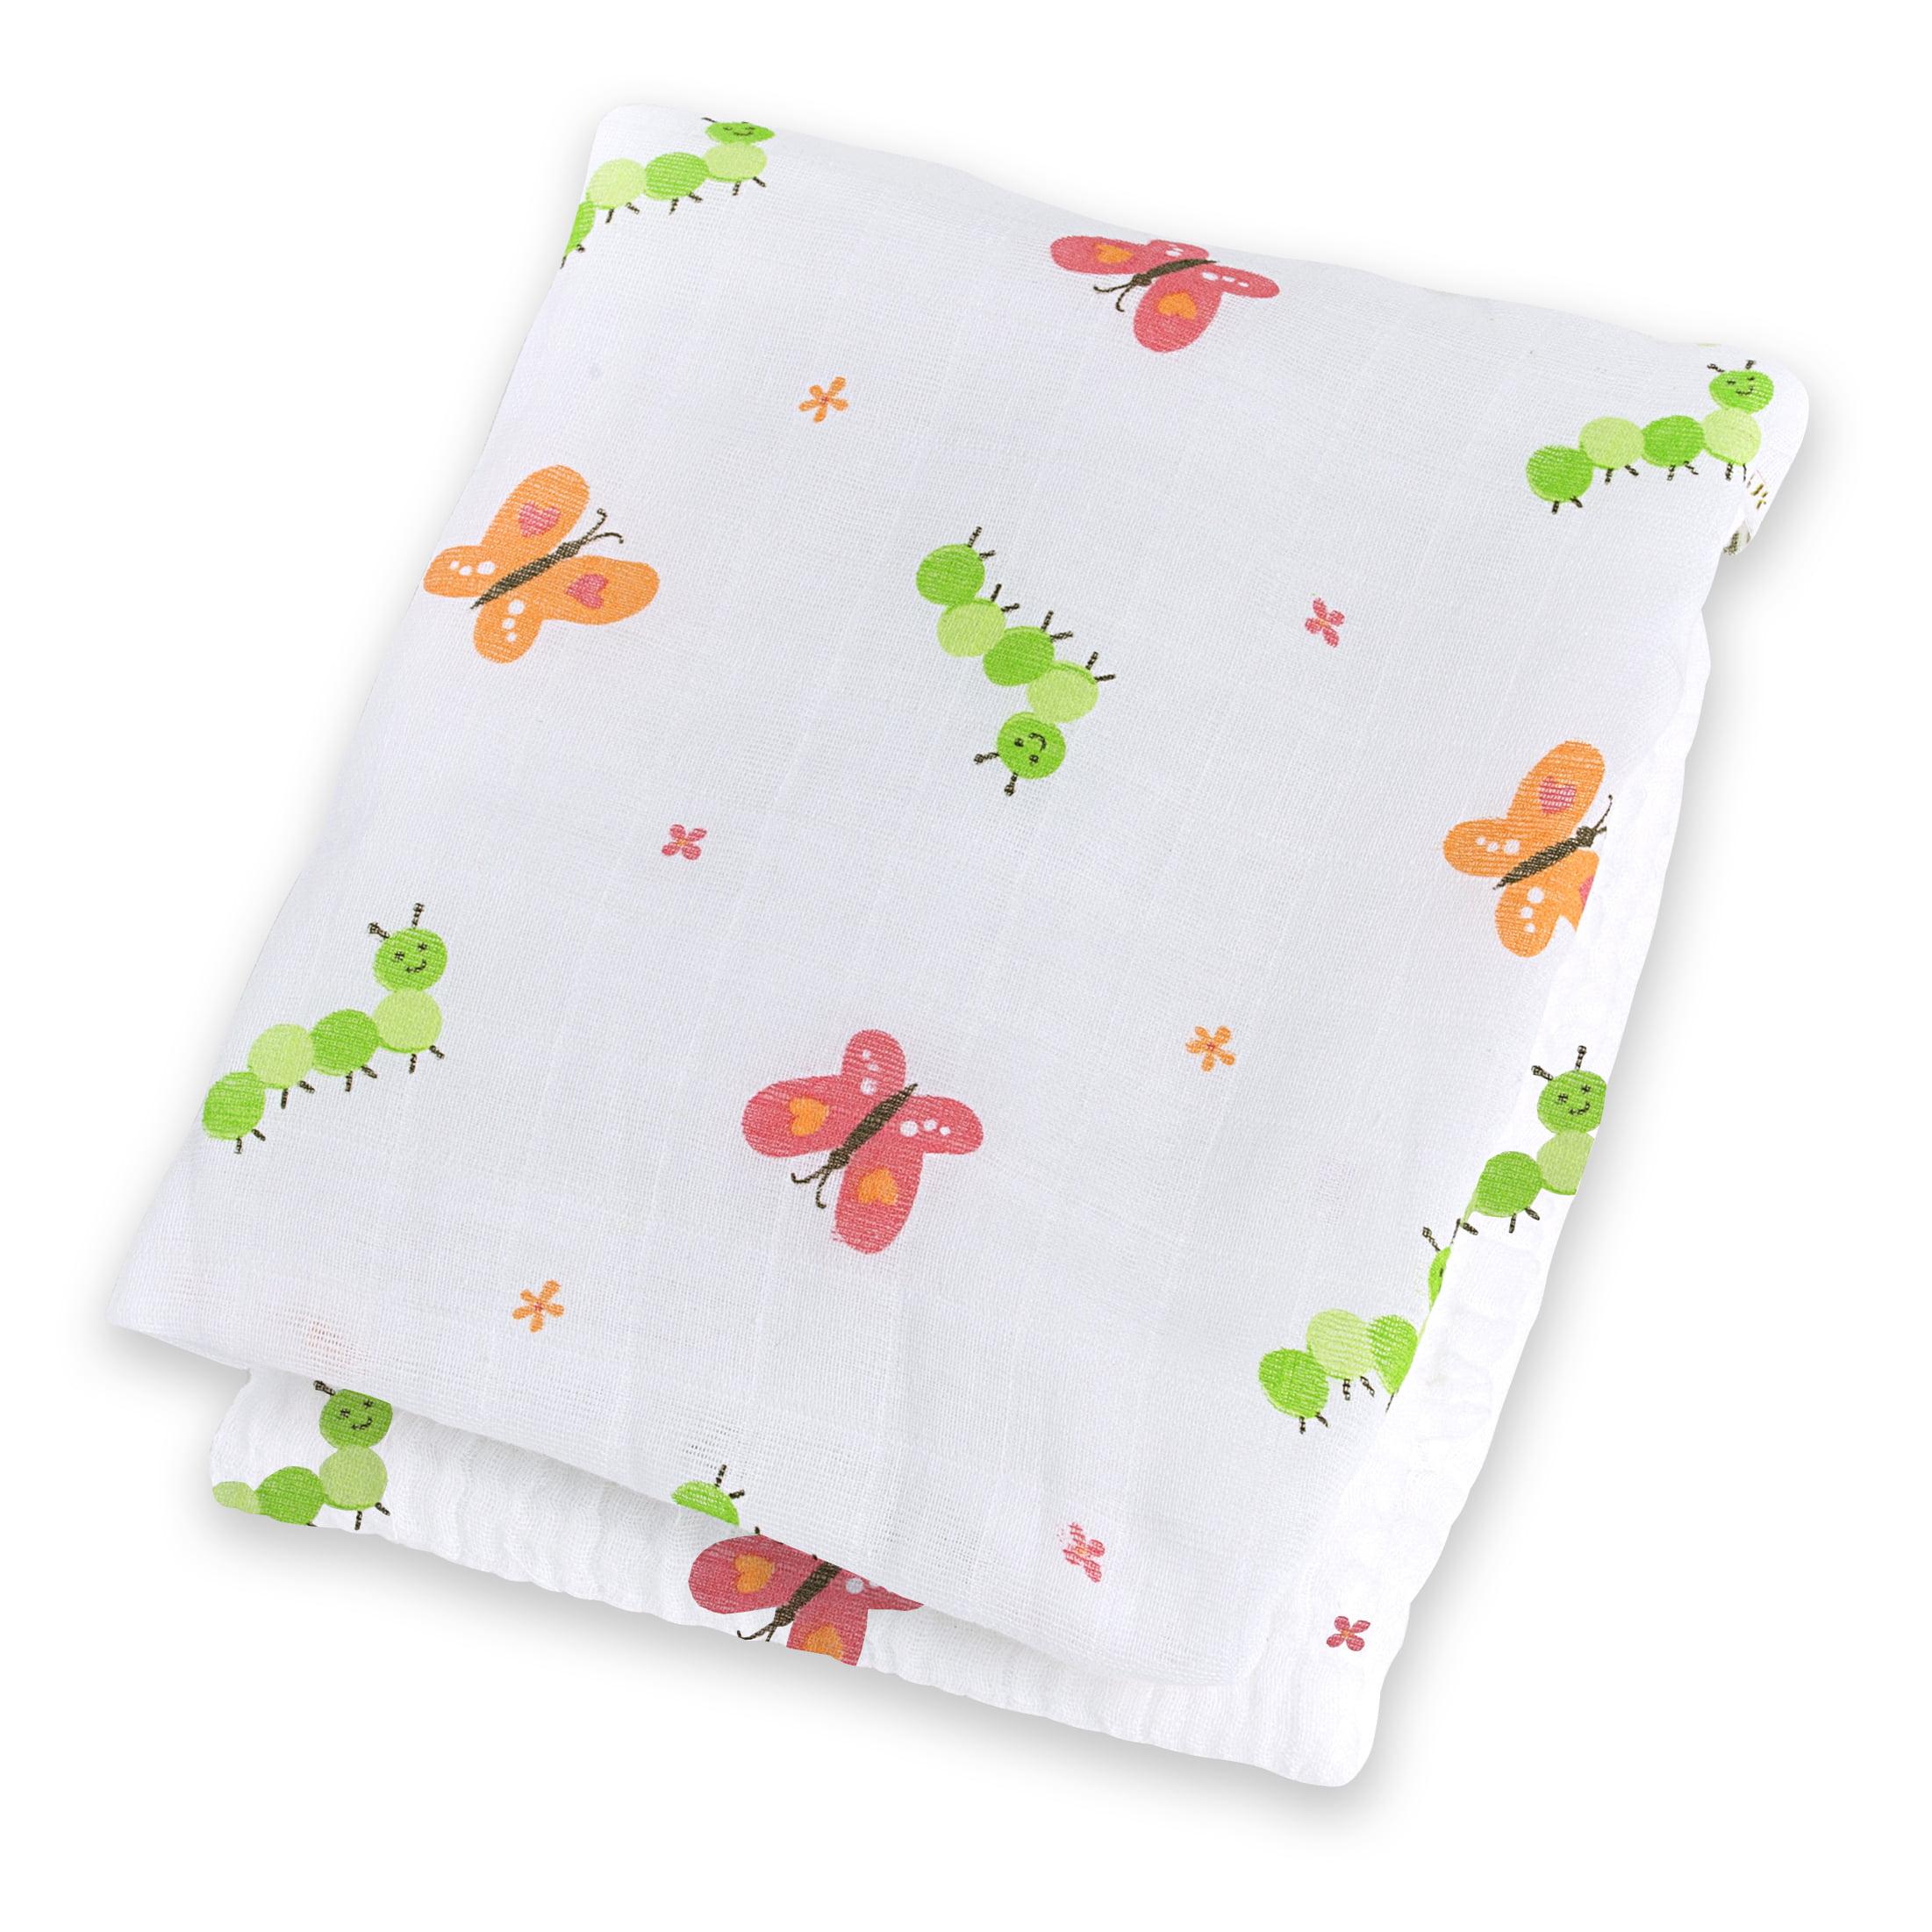 Lulujo Cotton Blanket - Garden Party